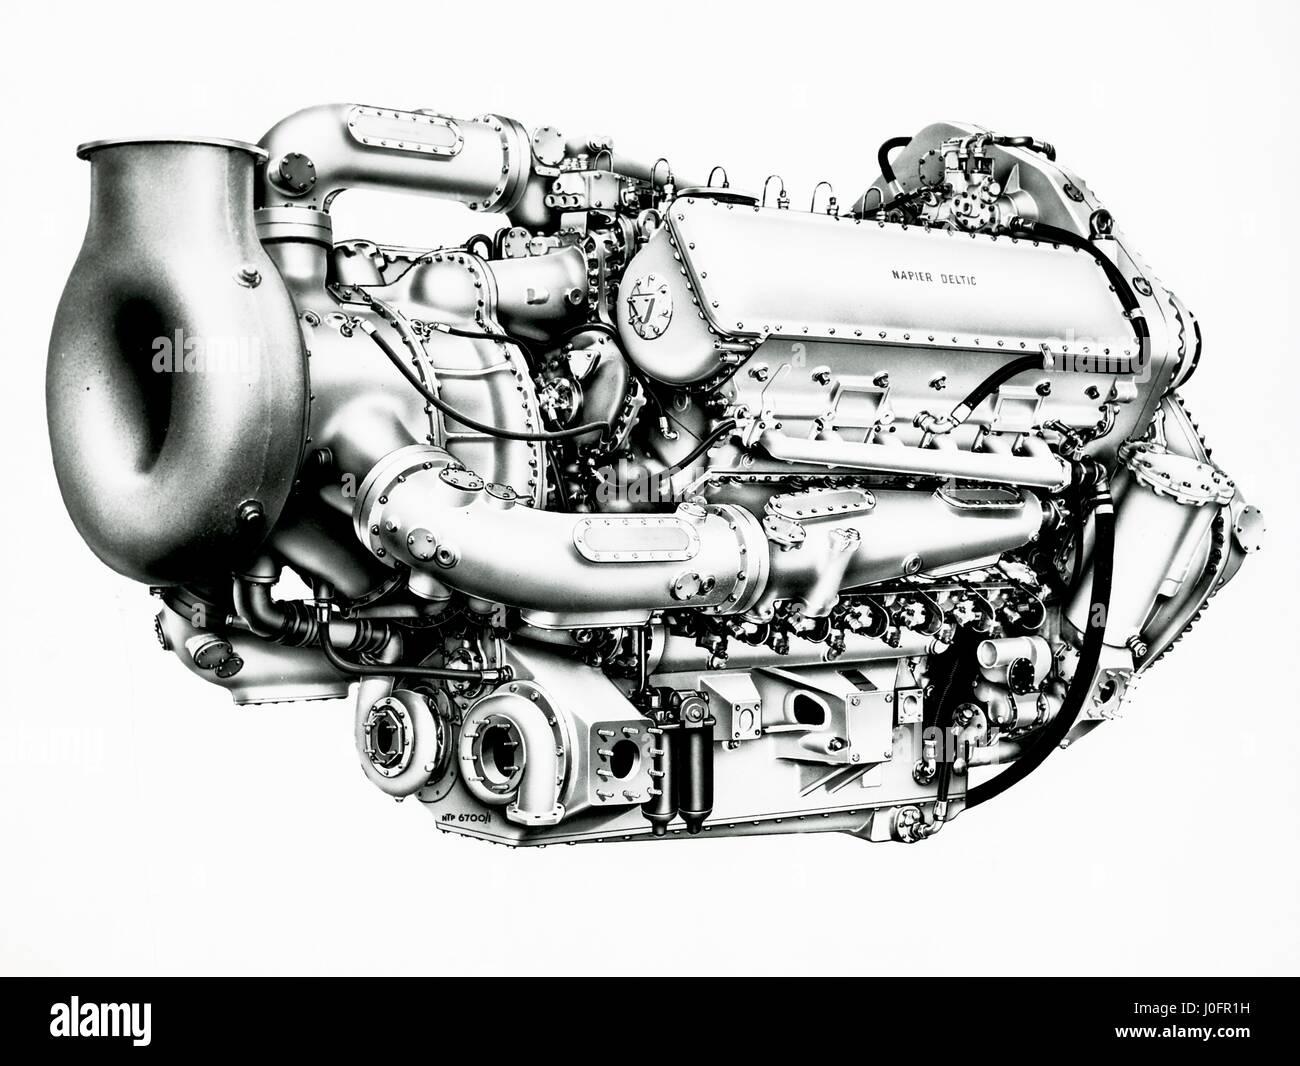 Napier Deltic Marine MTB engine, geared turbo blown - Stock Image